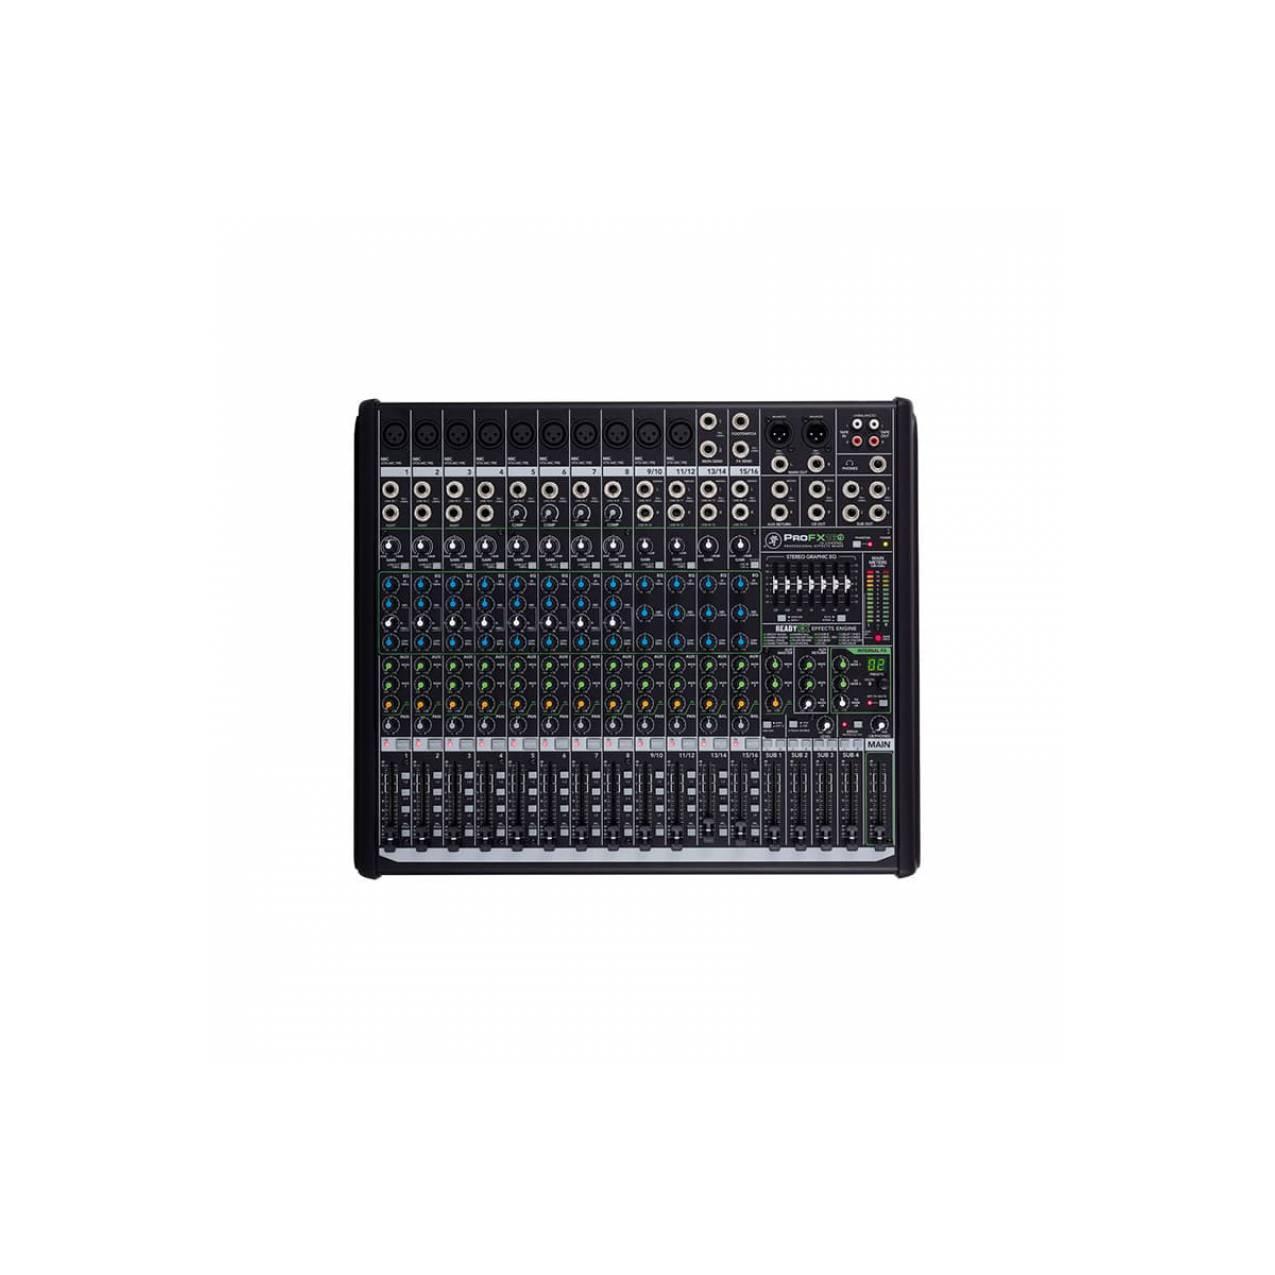 Mixer Mackie Pro FX 16 V2 16 Channel 4 Bus Effects Ori Garansi Resmi